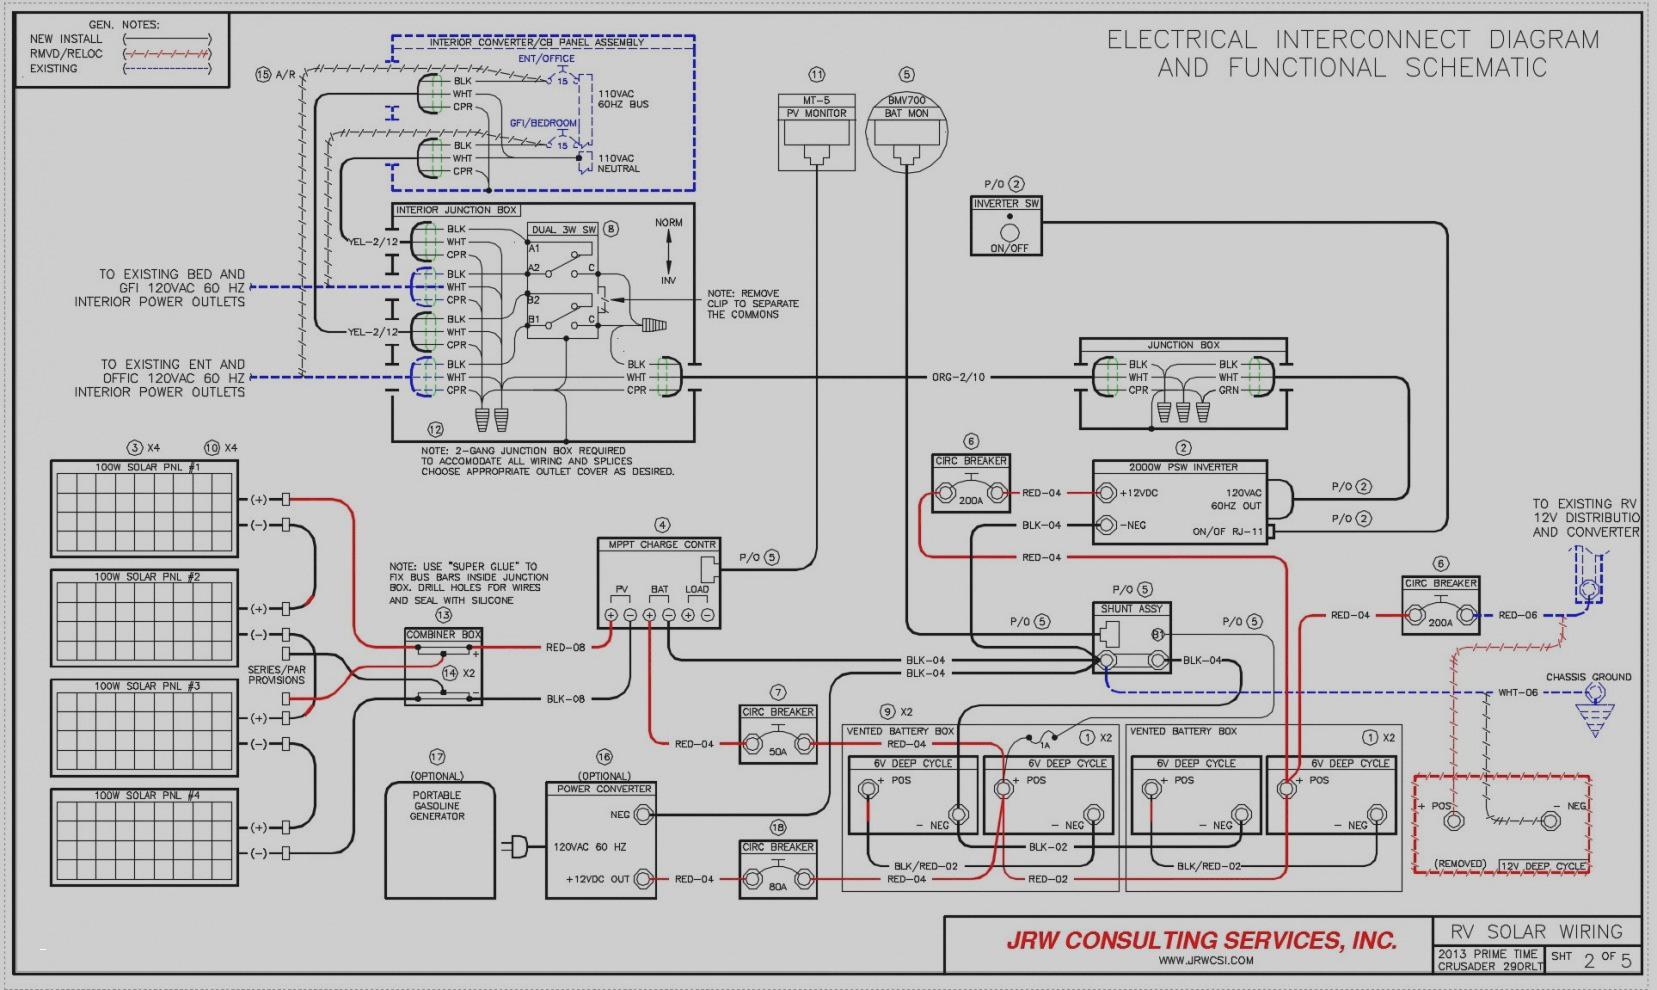 rv transfer switch wiring diagram Download-Wire Diagram Creator Inspirational 12 Wonderful Wiring Diagram Od Rv Park Wiring Diagrams Draw 20-t